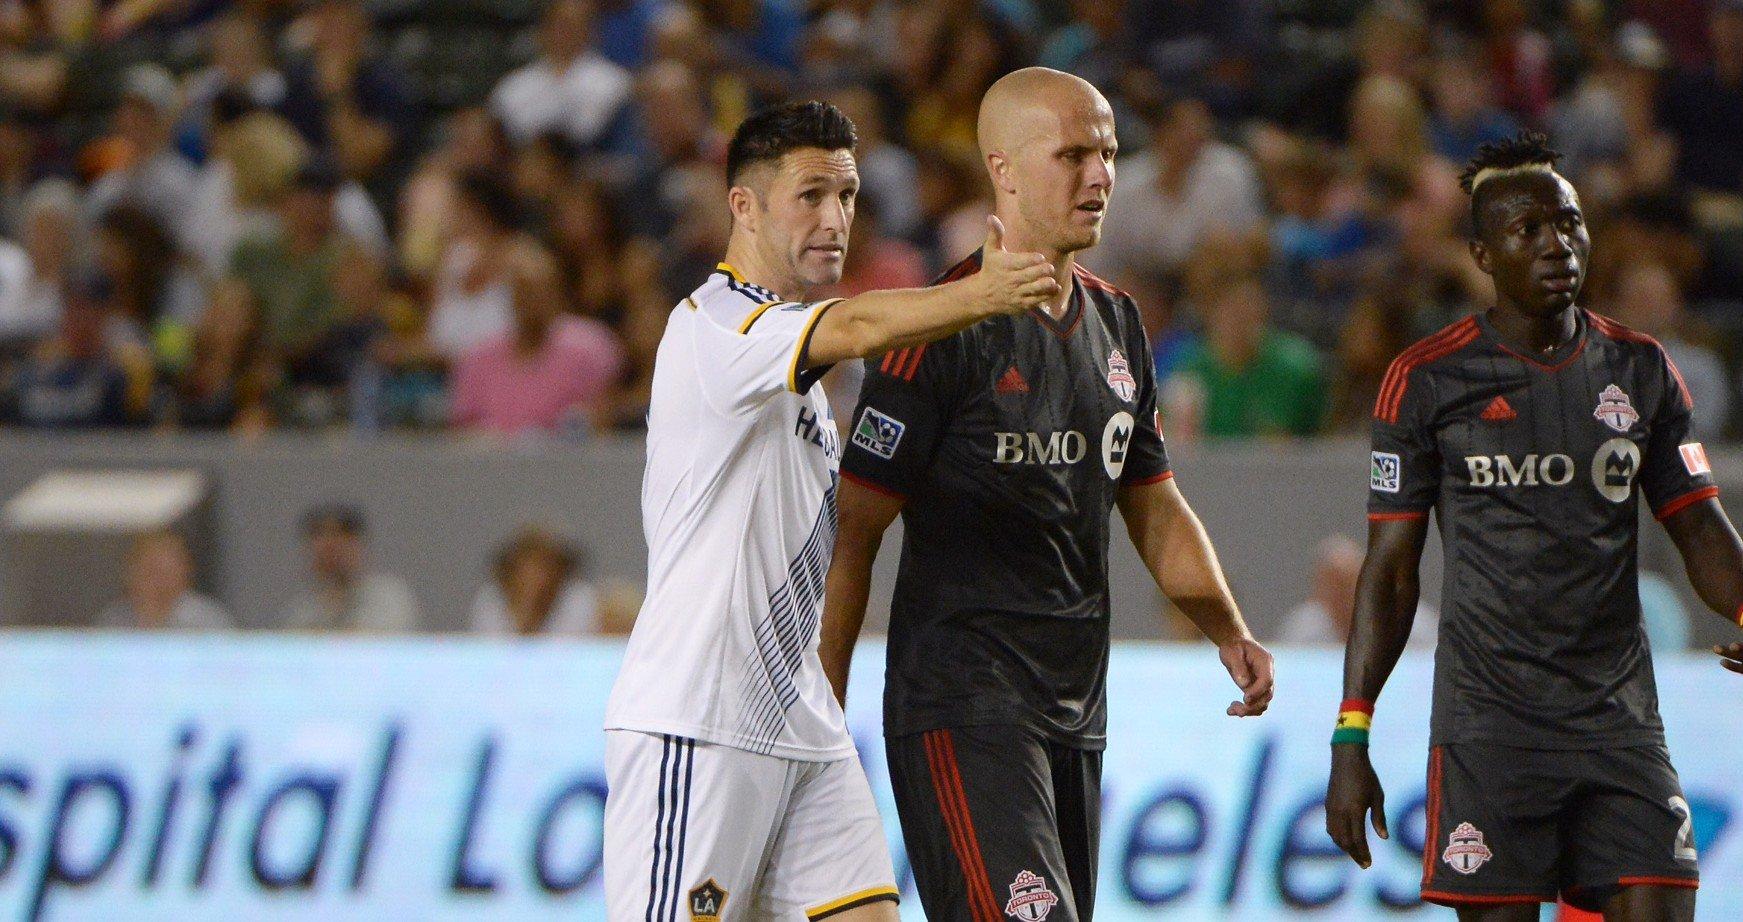 LA Galaxy's Robbie Keane talks to TFC's Michael Bradley